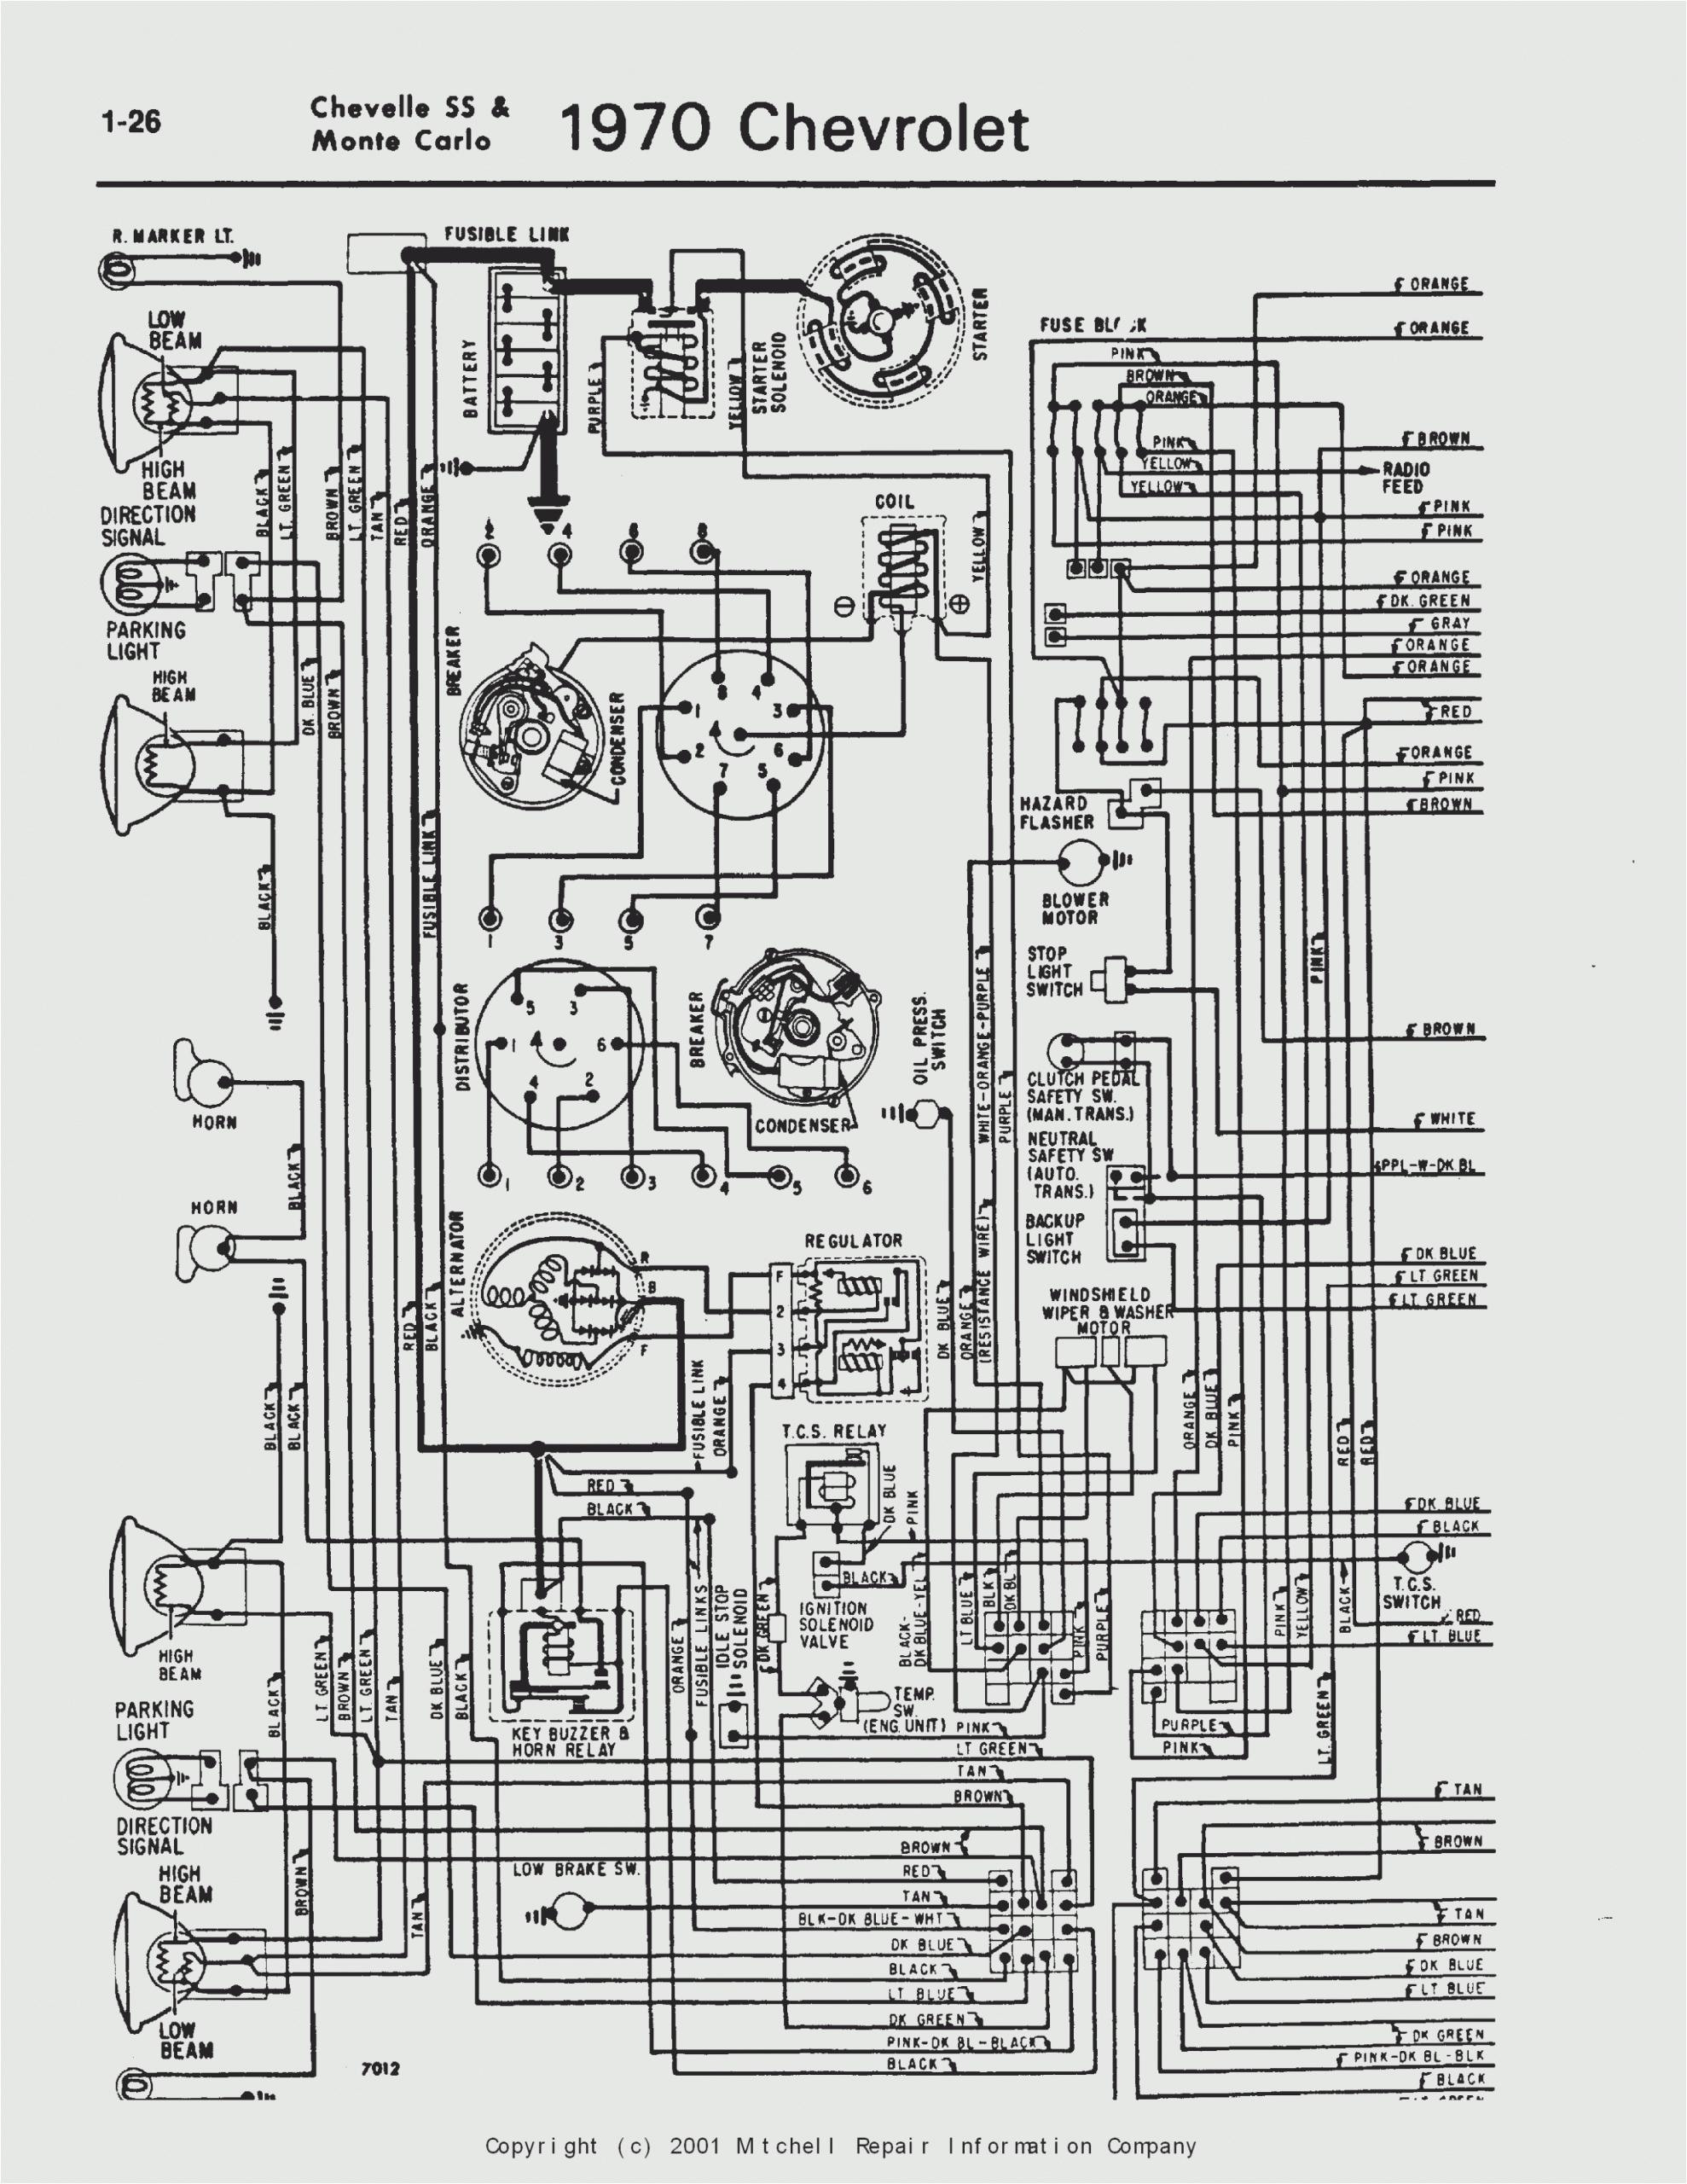 11f11a el camino horn relay wiring diagram wiring library el camino wiring diagram scaled gif